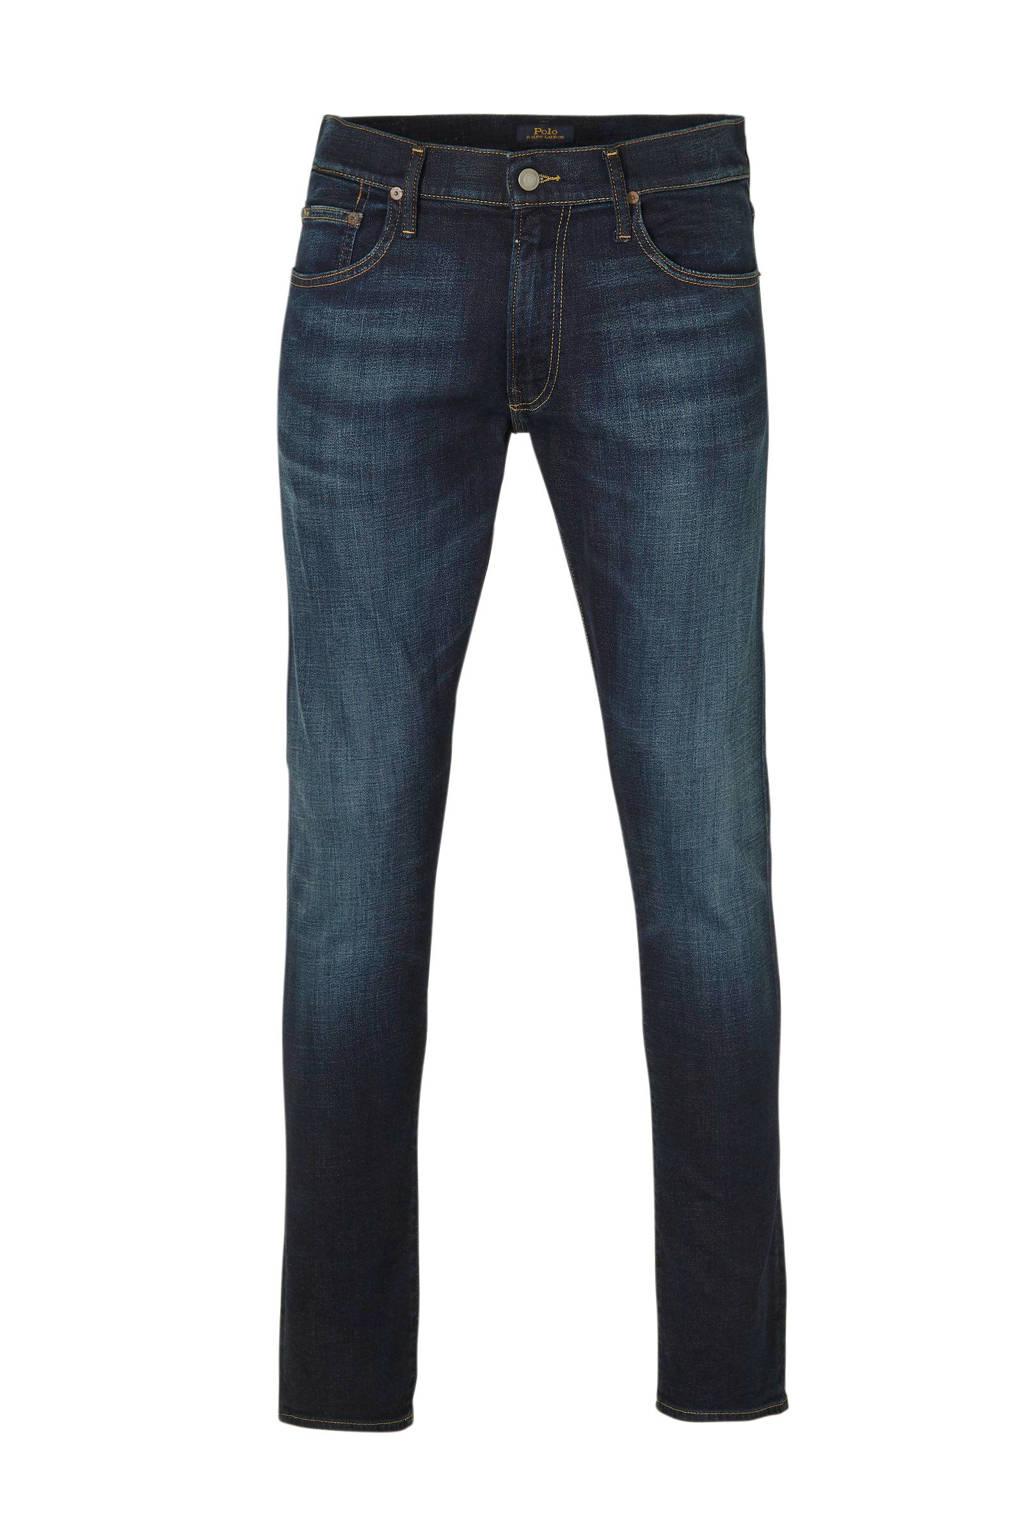 POLO Ralph Lauren slim fit jeans Sullivan, Murphy stretch